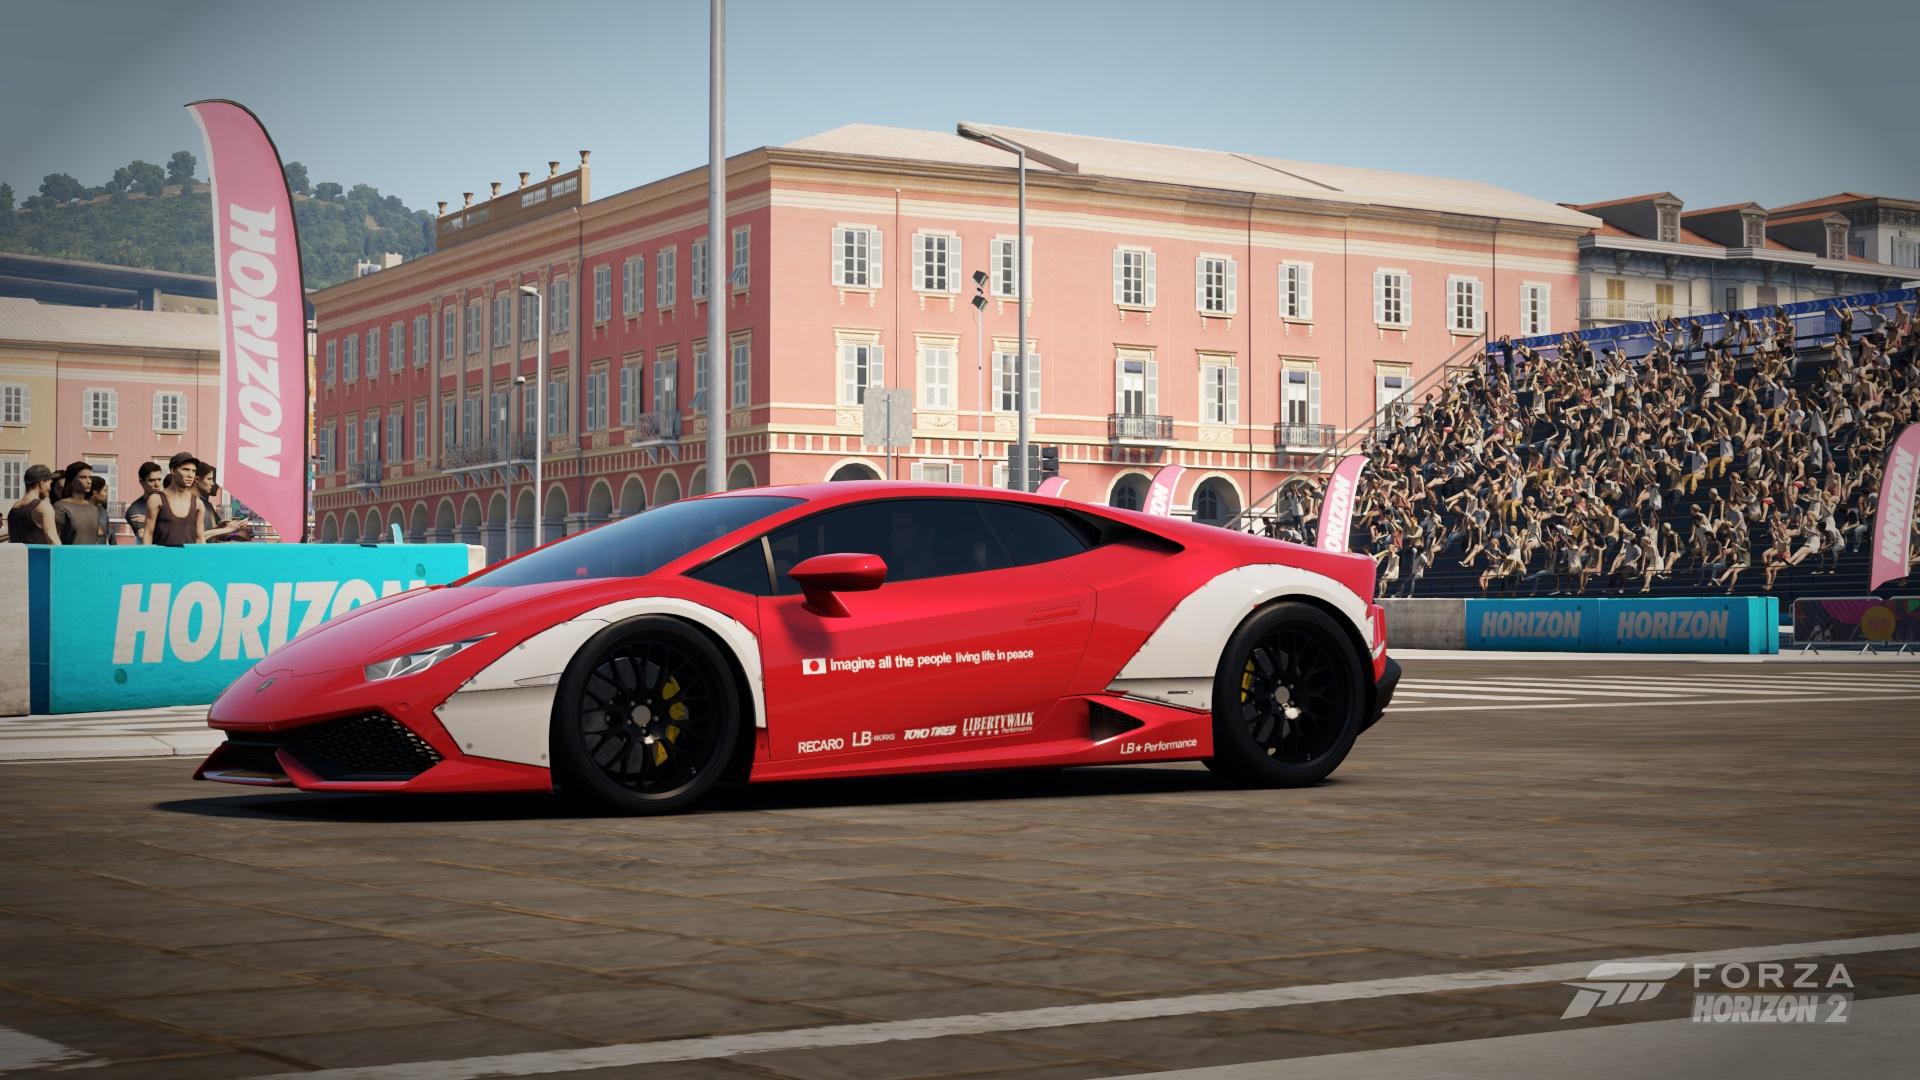 3dtuning-snapshot-5589c64078d7b Elegant Lamborghini Huracan forza Horizon 2 Cars Trend